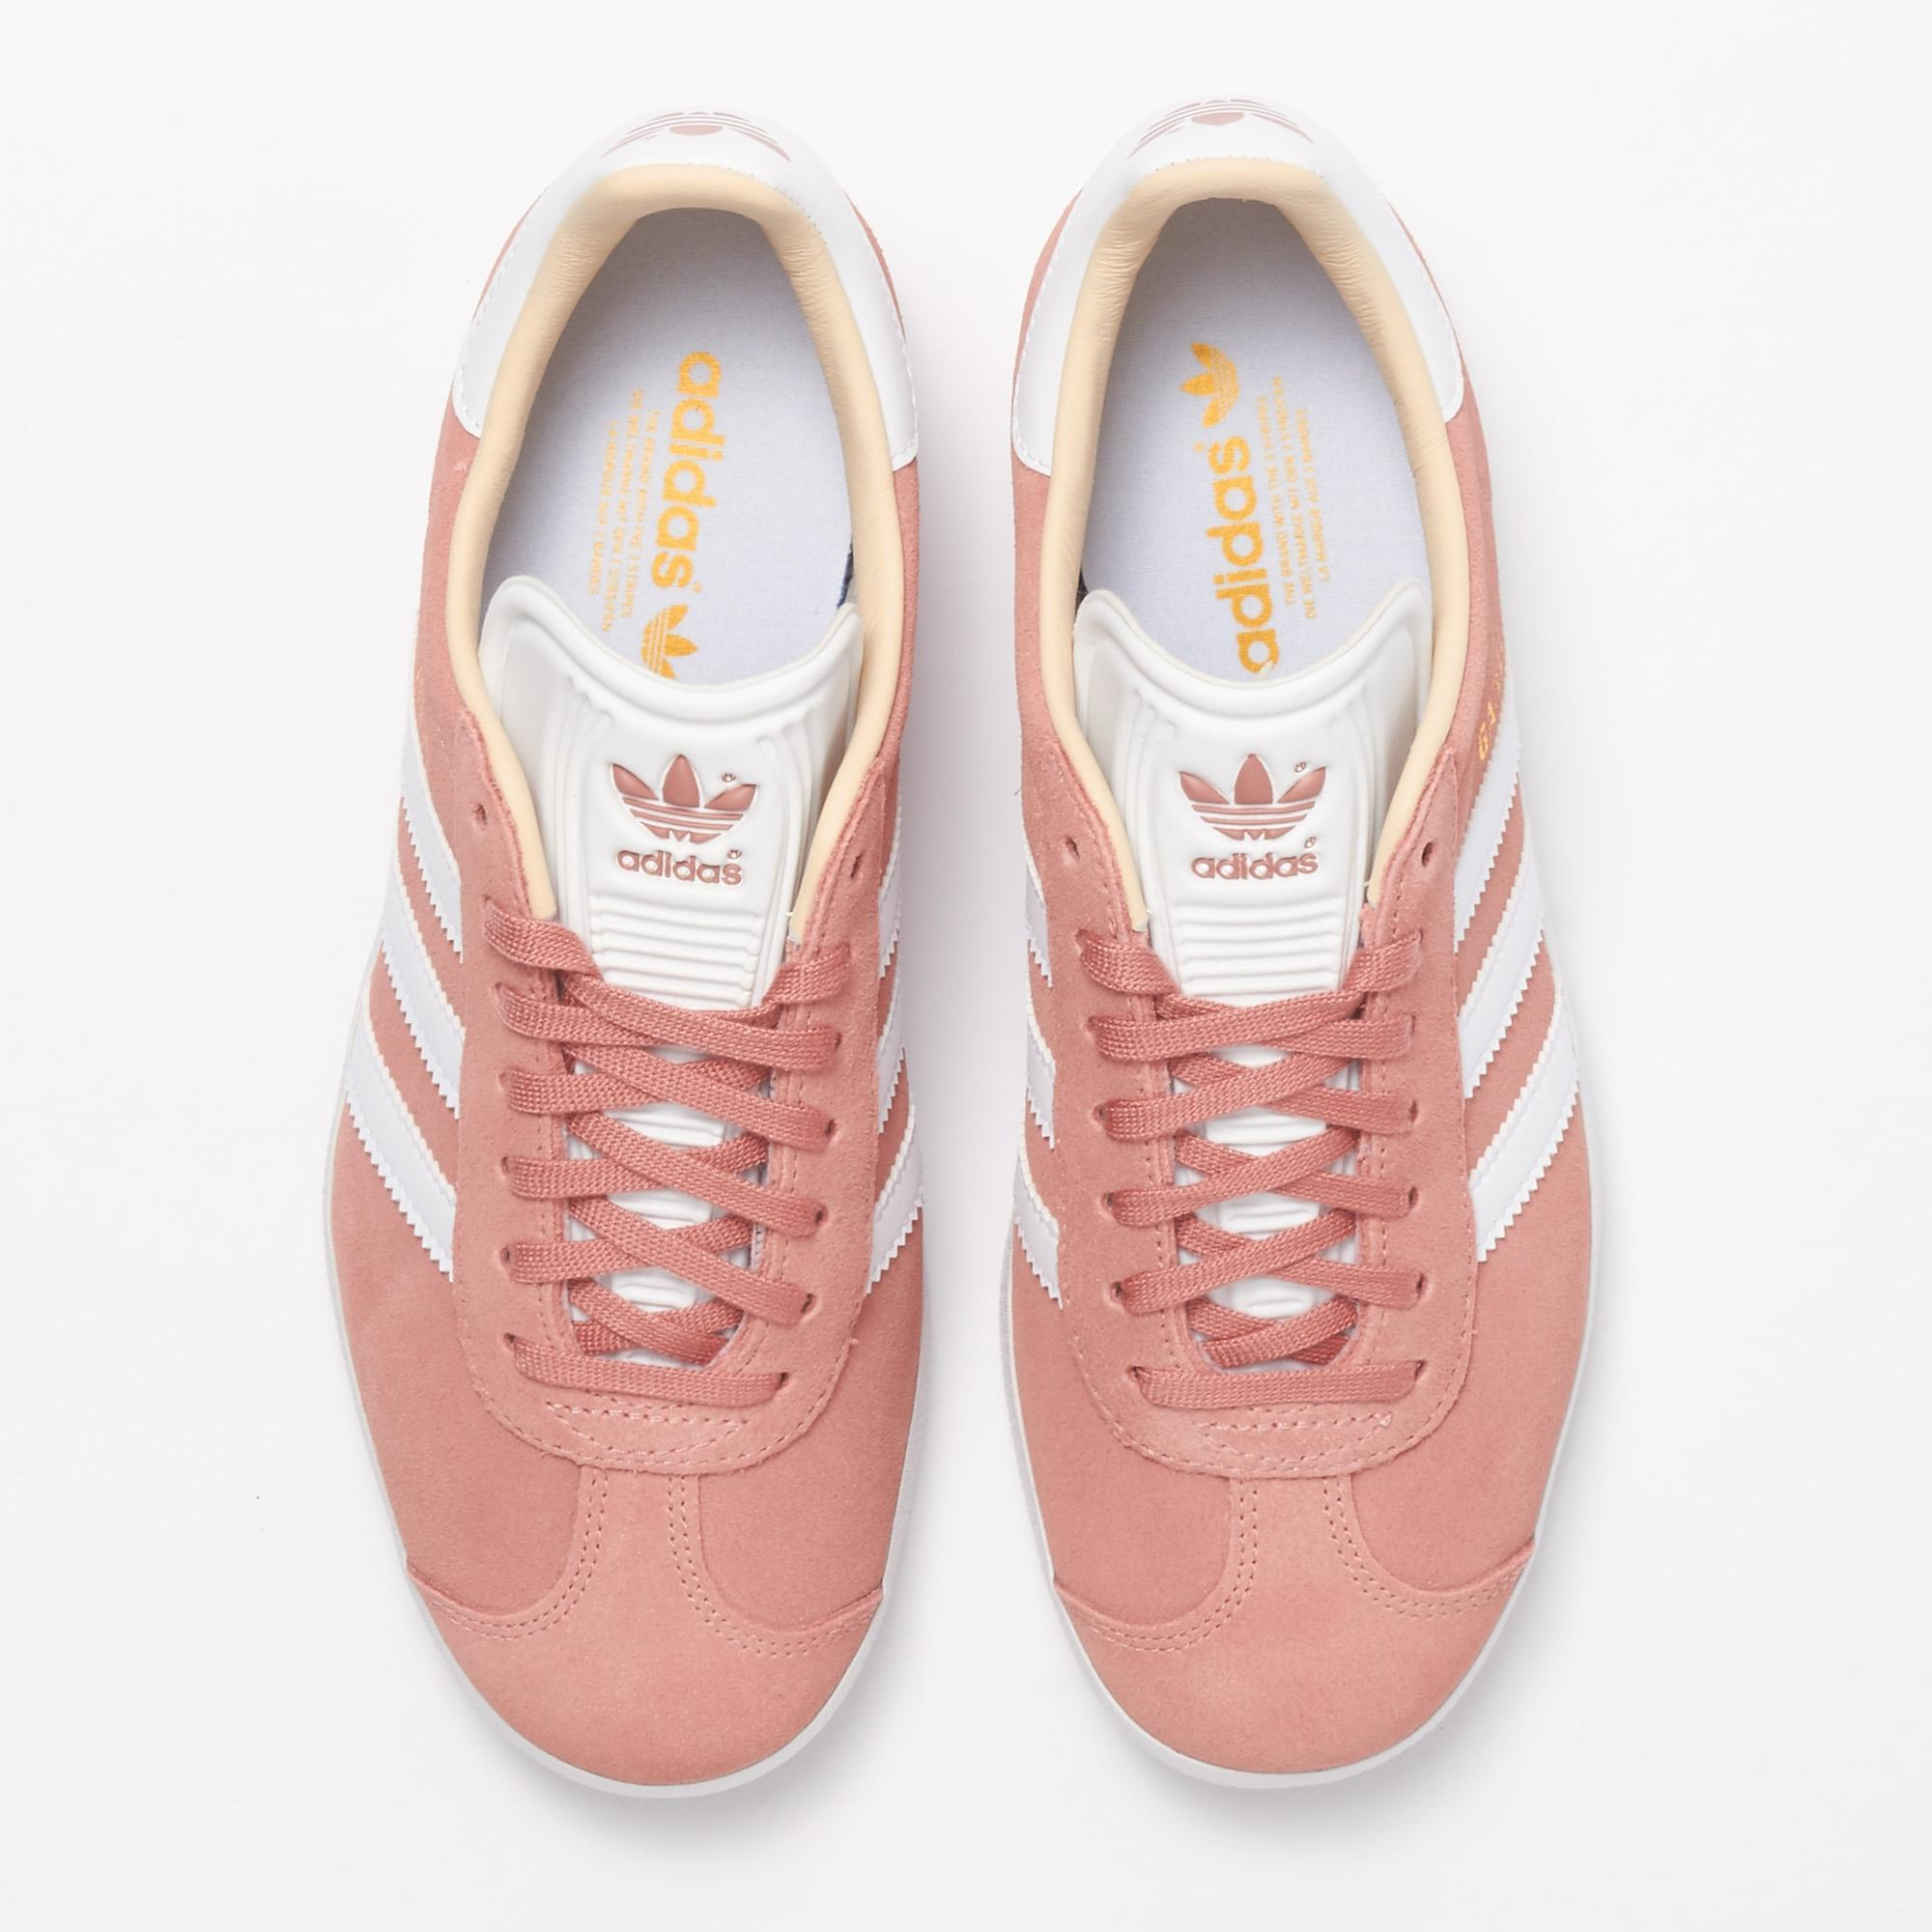 Lyst adidas Originals Gazelle Trainers ash Pearl en color rosa